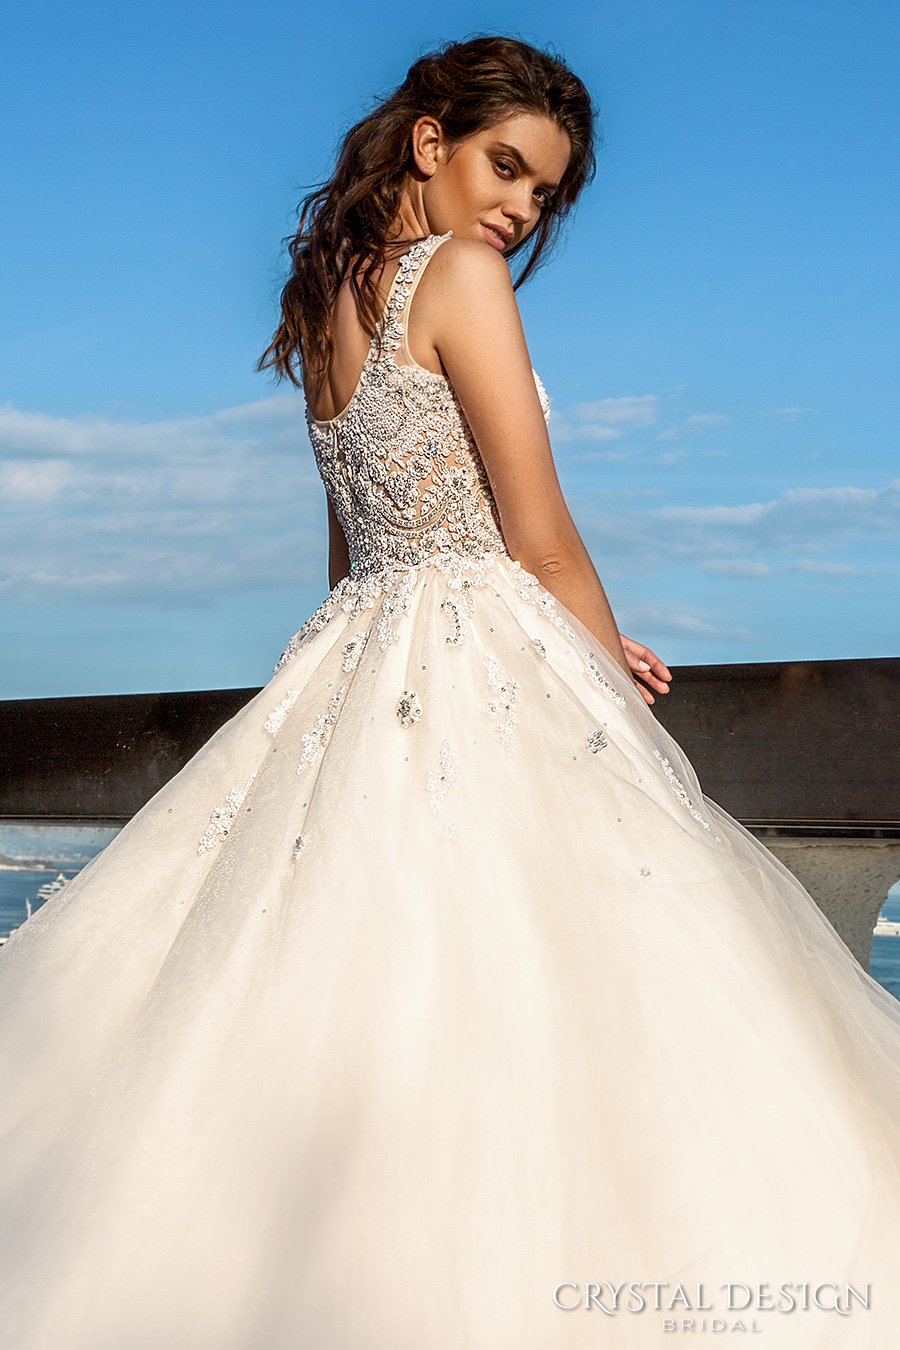 crystal-design-2017-bridal-sleeveless-with-strap-scoop-necklne-heavily-embellished-bodice-romantic-a-line-wedding-dress-scoop-back-royal-long-train-carven-zbv